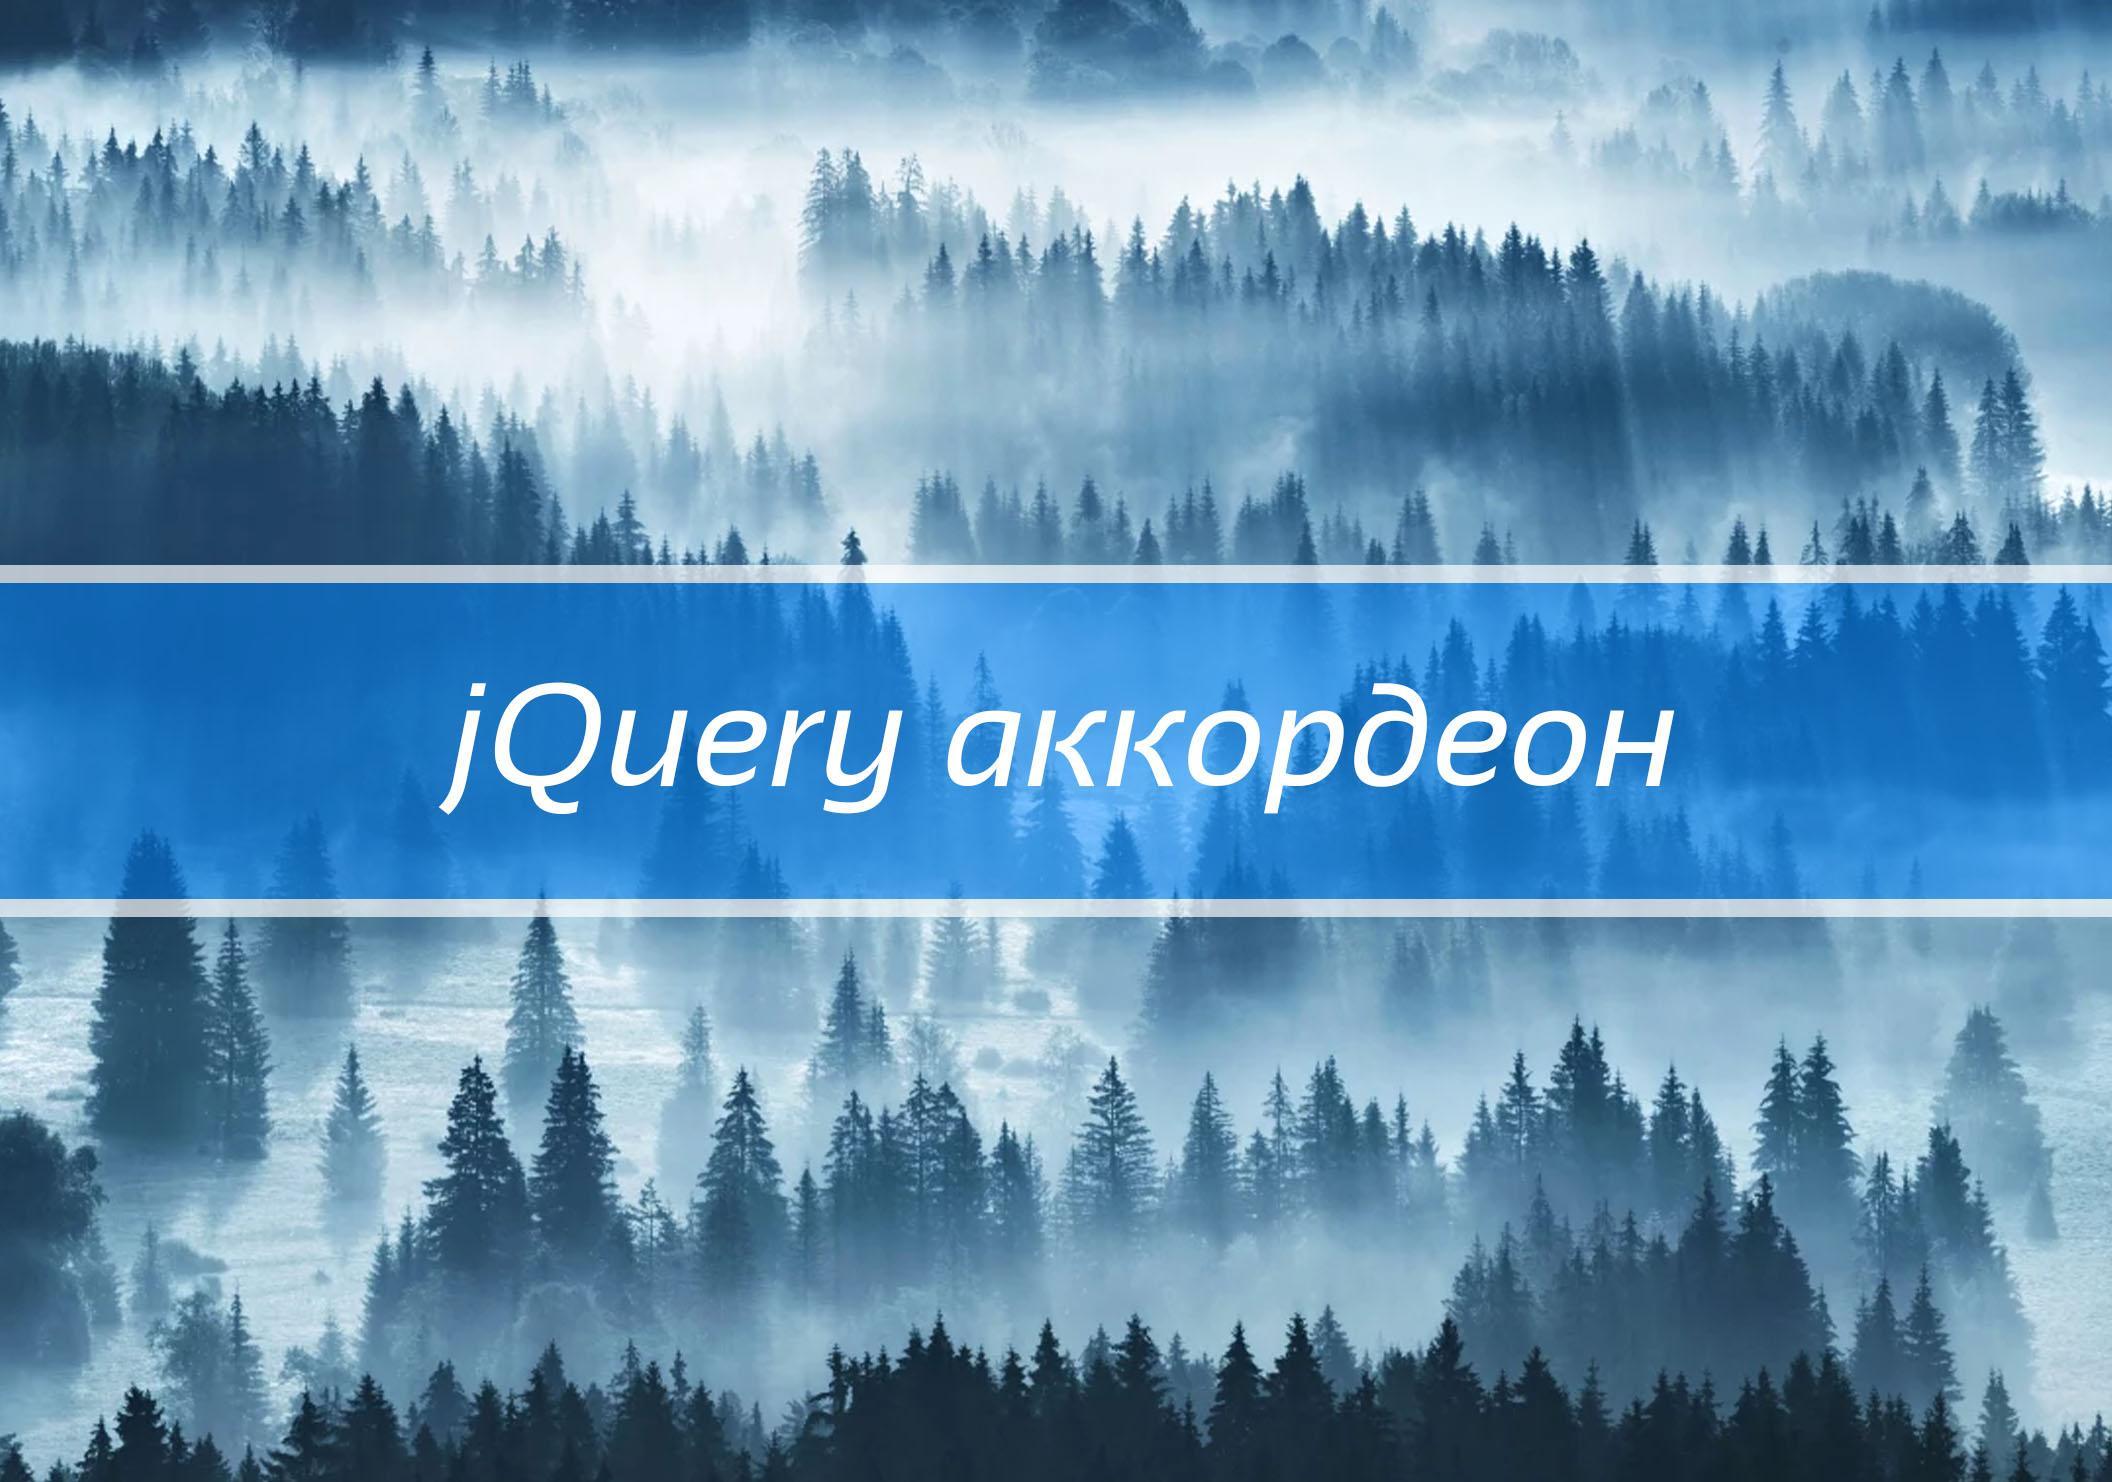 jQuery аккордеон